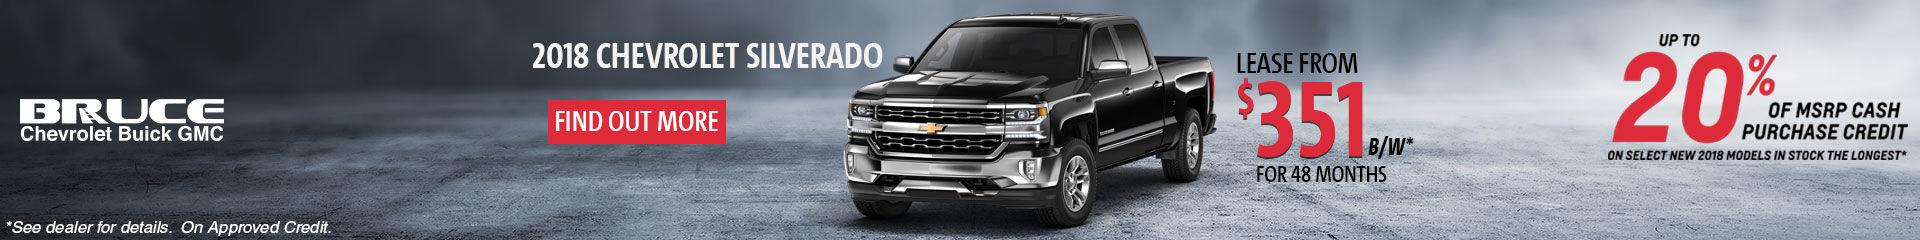 Lease the 2018 Chevy Silverado